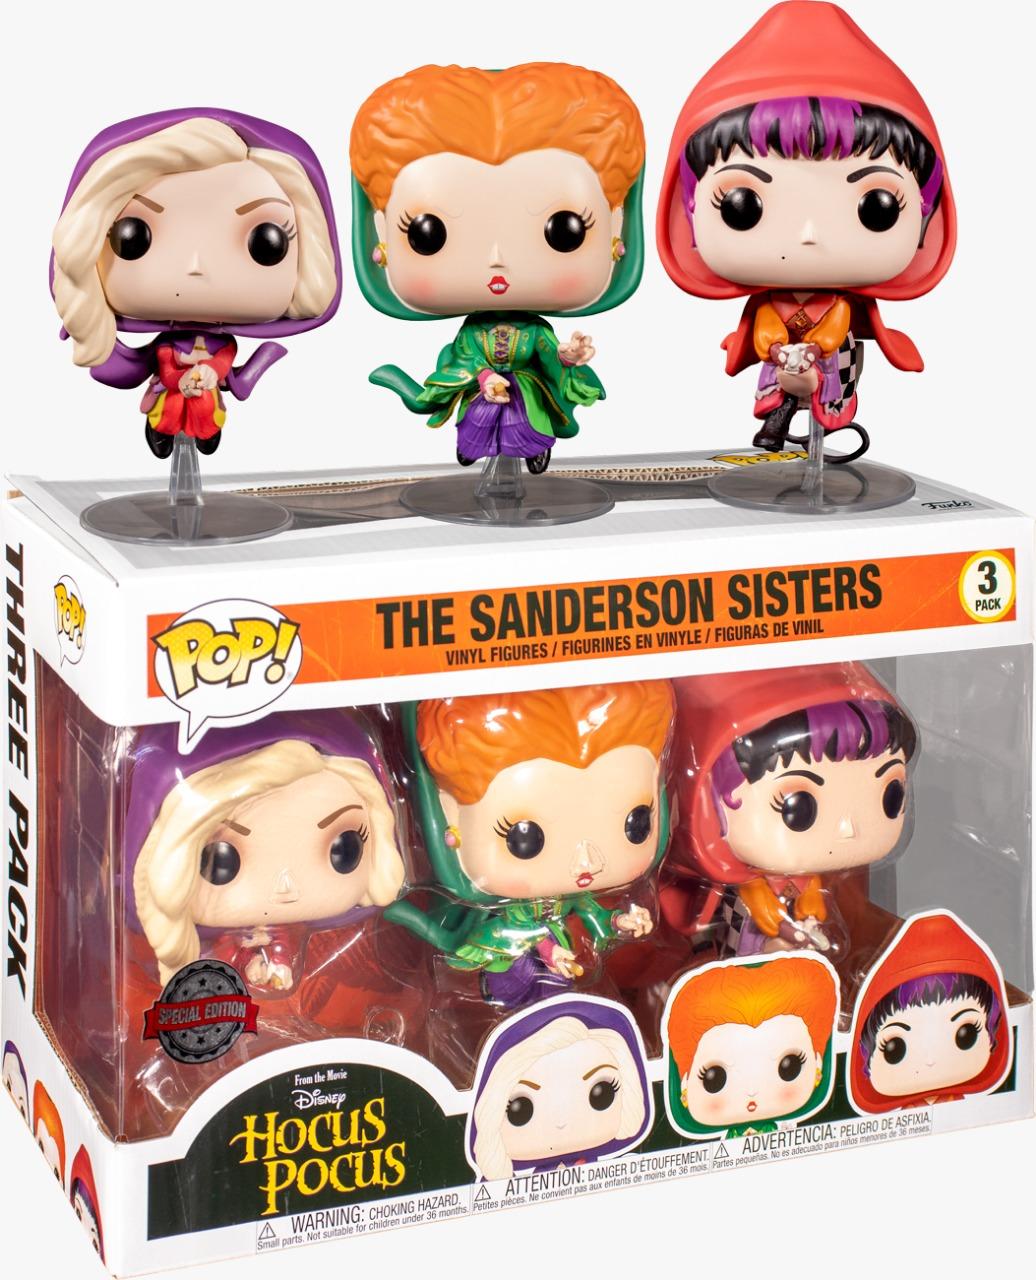 Funko Pop! Pack Com 3 As Irmãs Sanderson The Sanderson Sisters Winifred, Mary, Sarah: Hocus Pocus Abracadabra - Funko